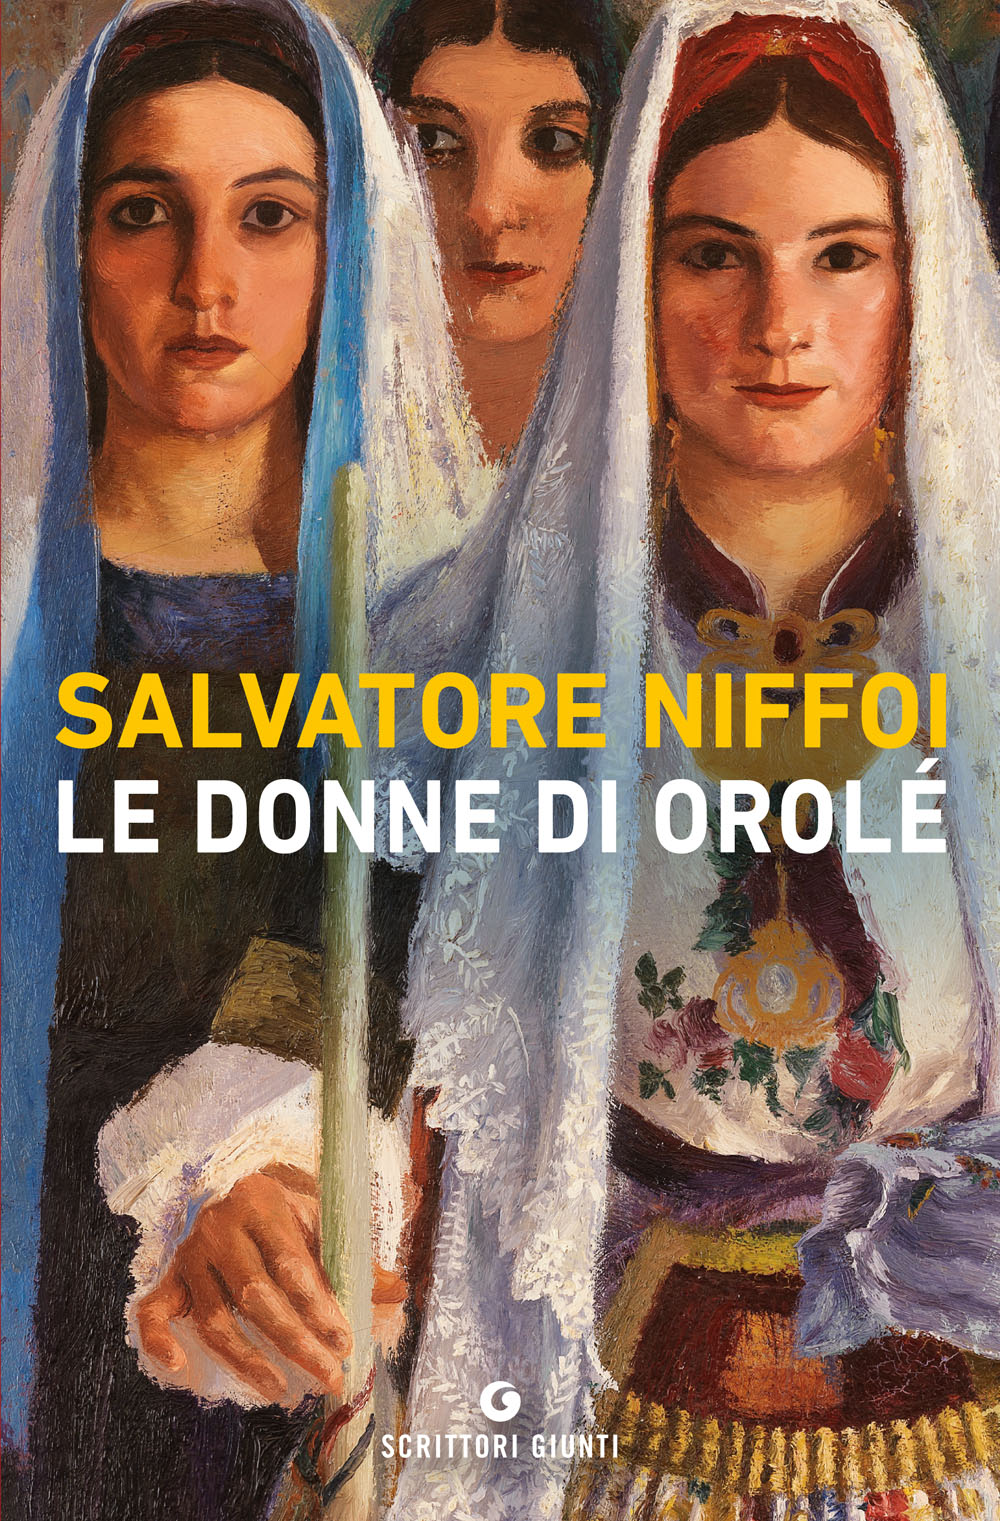 Le donne di Orolé (The women of Orolé)